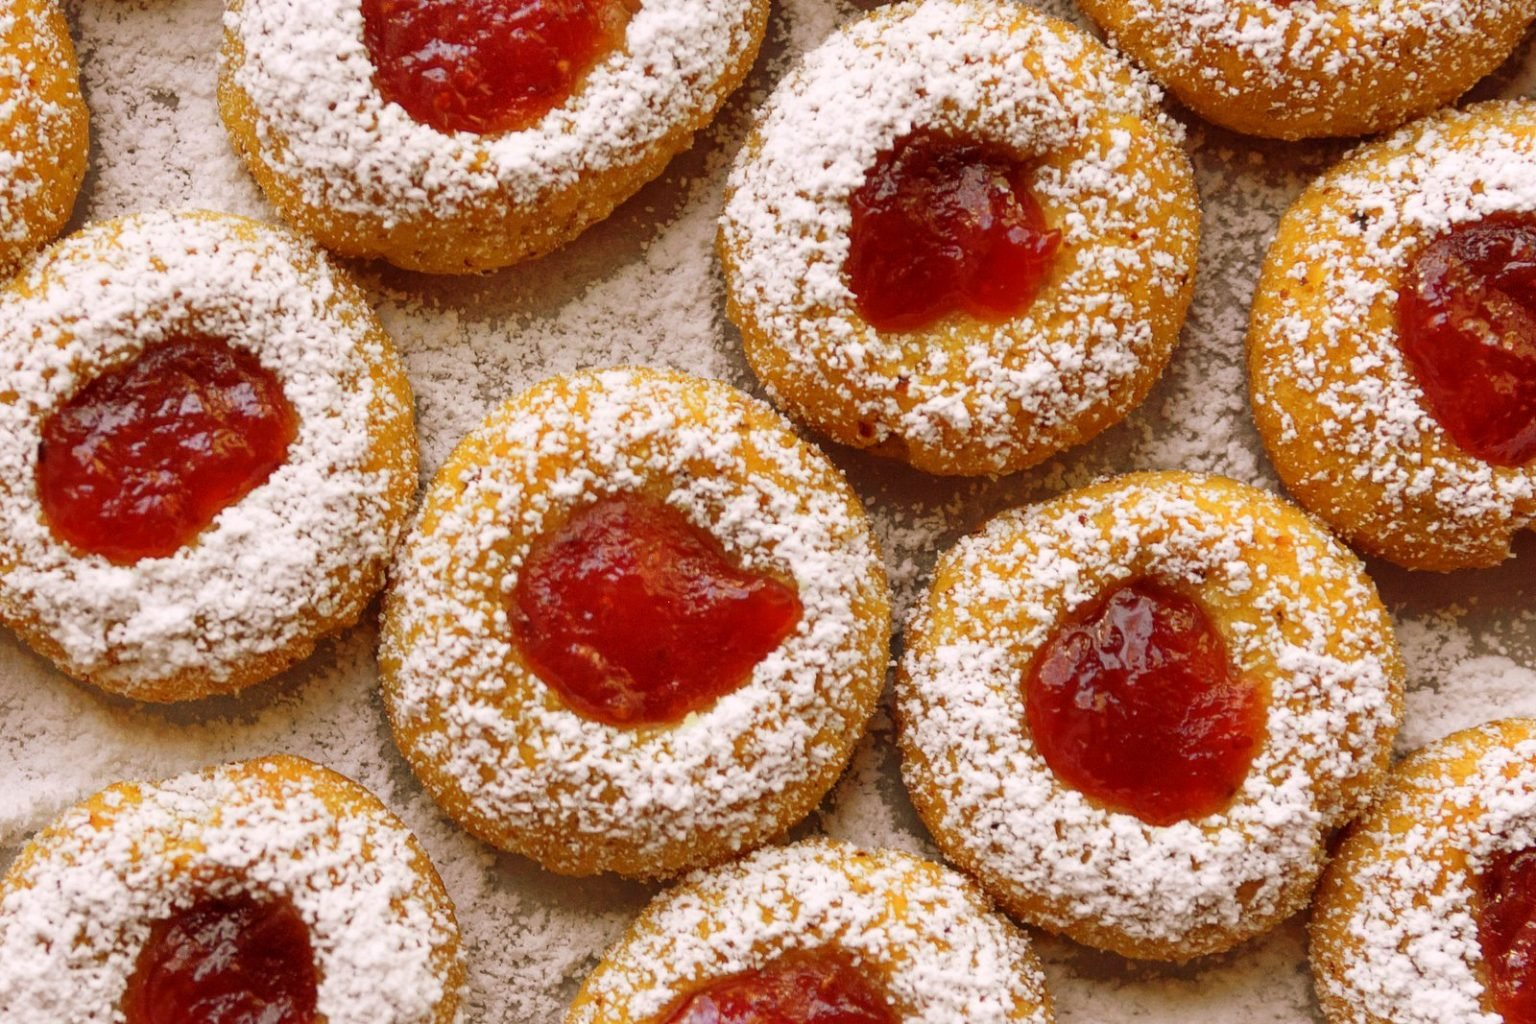 Snow-topped jam thumbprint cookie recipe (1990)